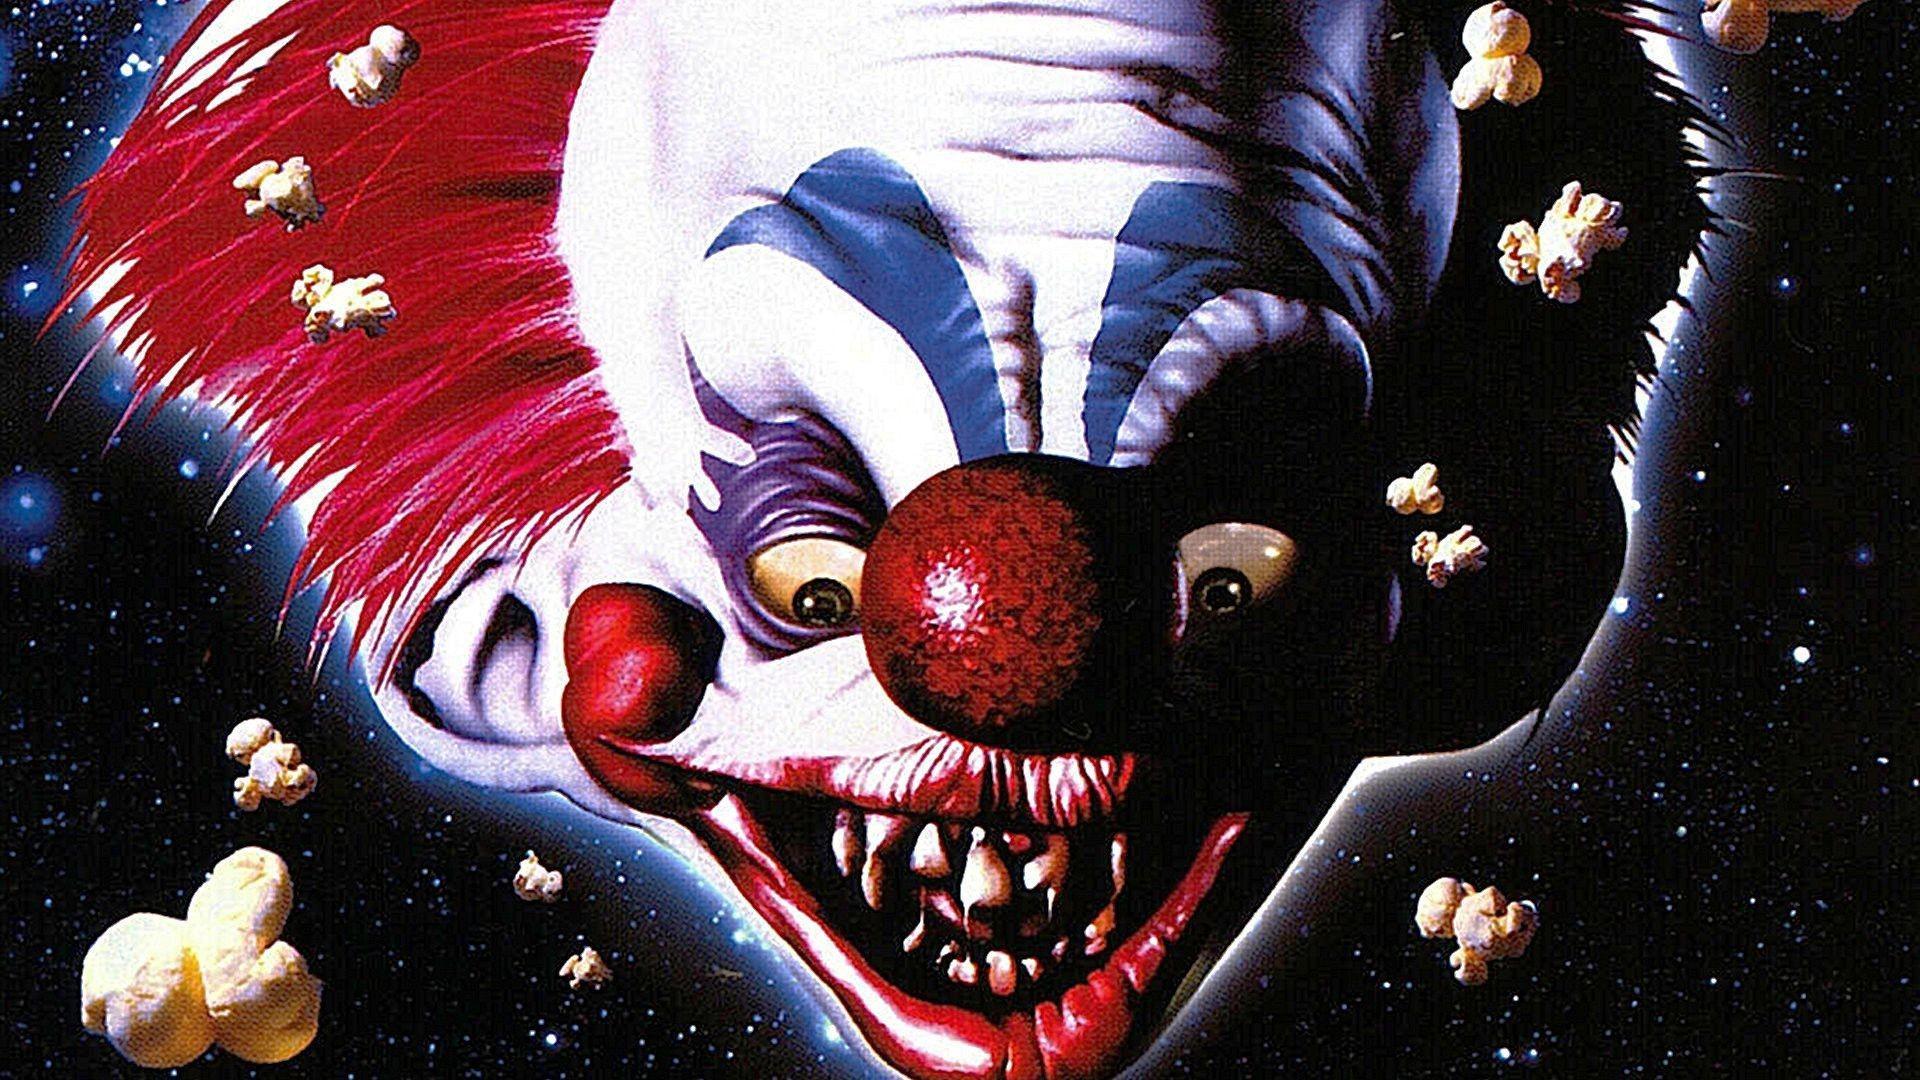 Res: 1920x1080, Scary Clown Wallpaper apk screenshot Source · Killer Clown Wallpapers Group  50